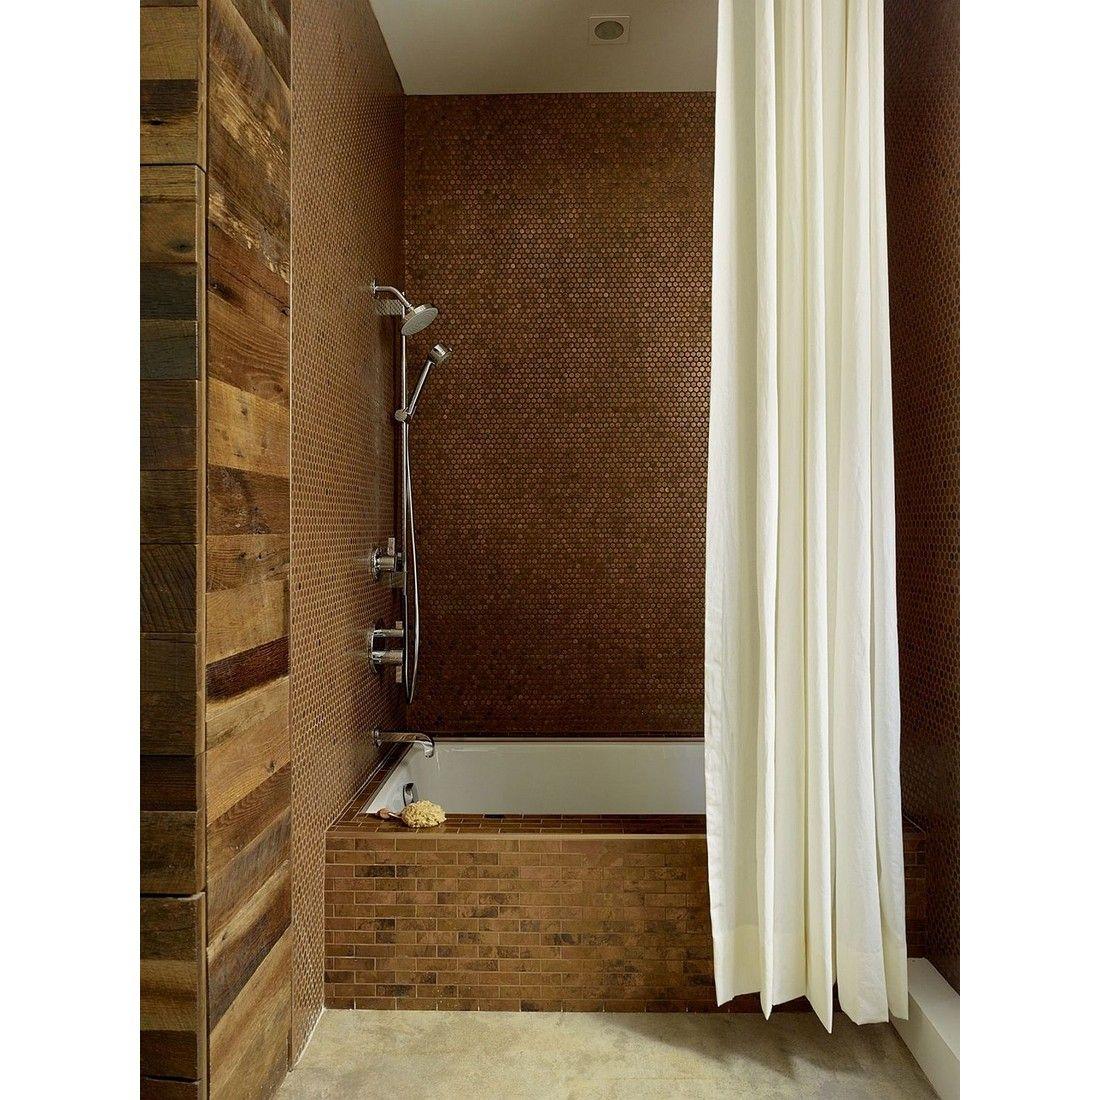 Copper Penny Tiles Create A Shinning Bathroom Walls Rumahkubathroom Bathroom Design Penny Tiles Bathroom Eclectic Bathroom